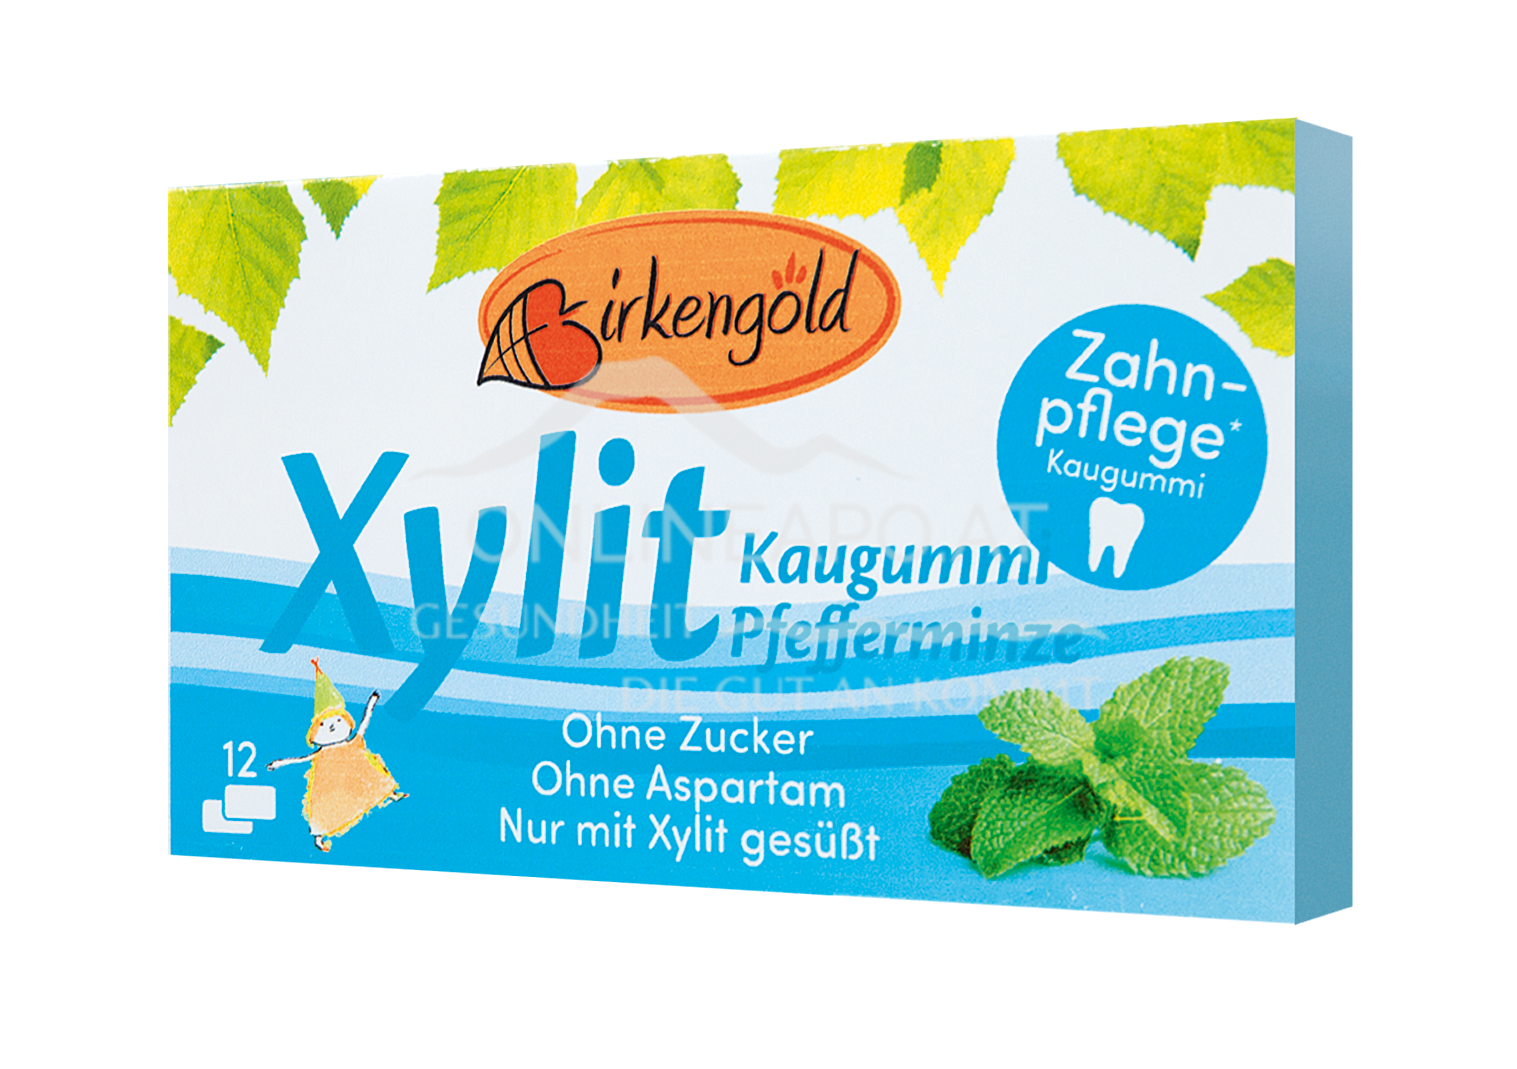 Birkengold Kaugummi Pfefferminze